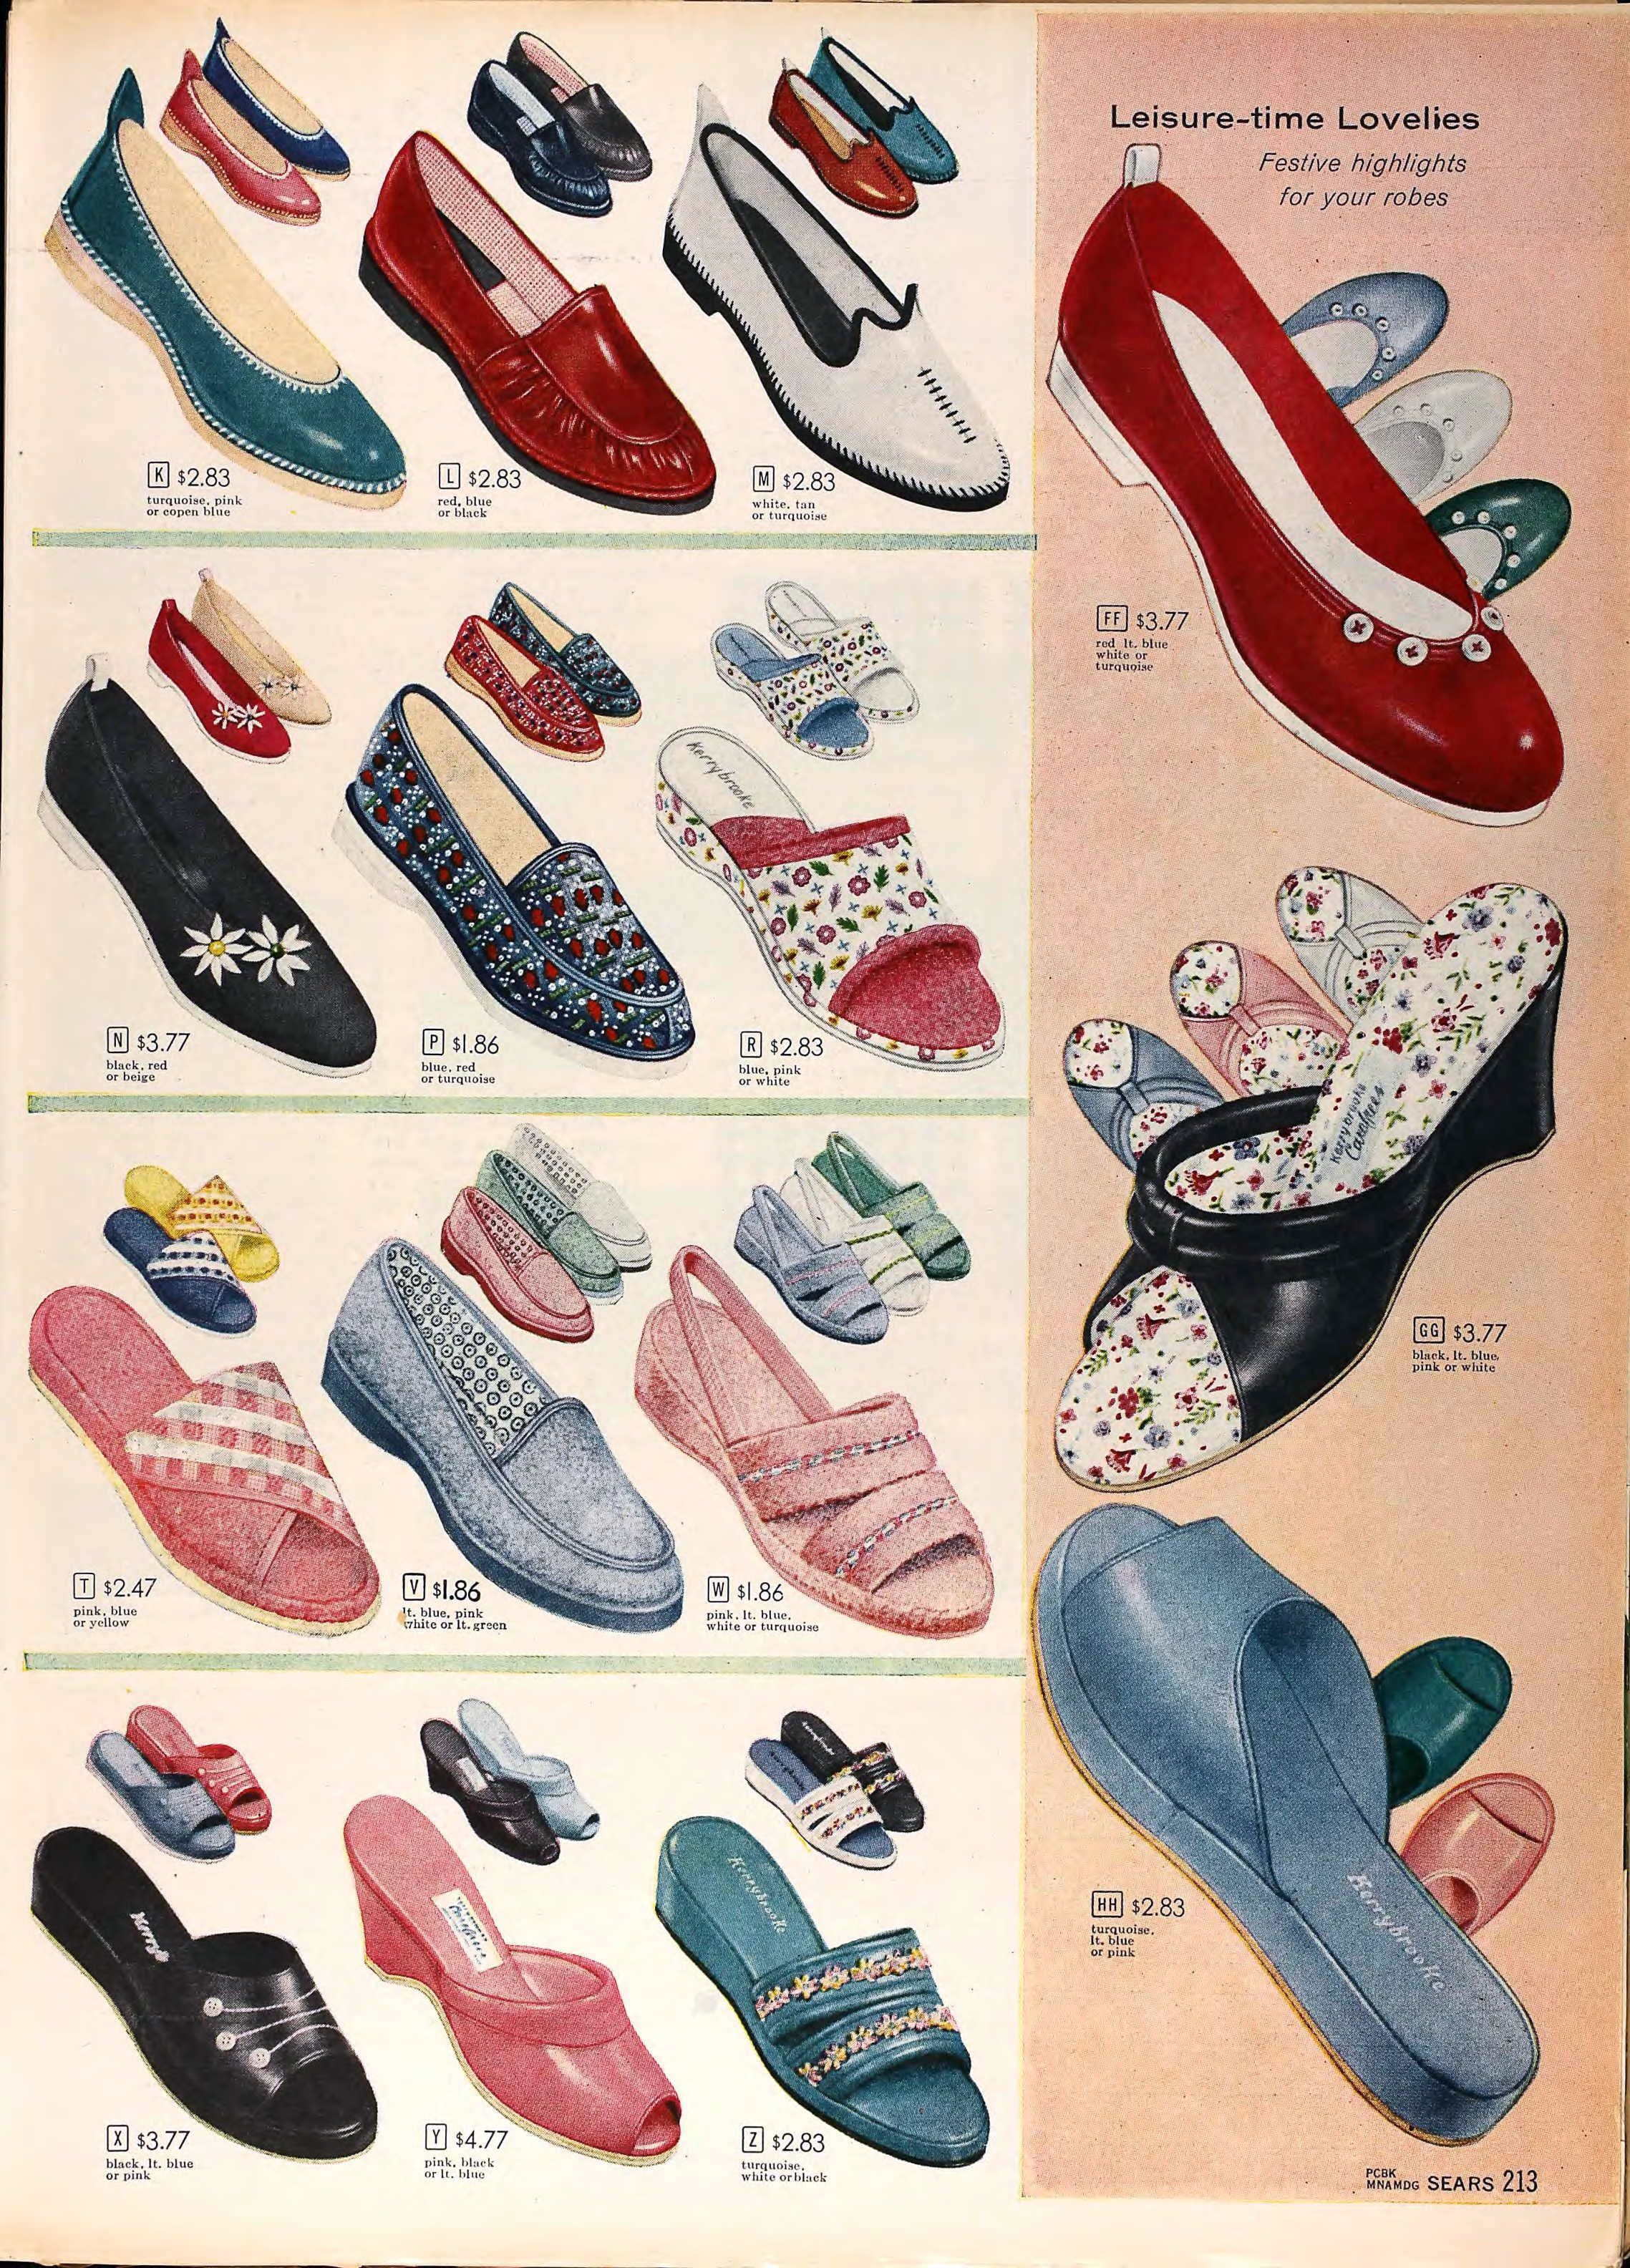 Sears catalog, 1920s fashion